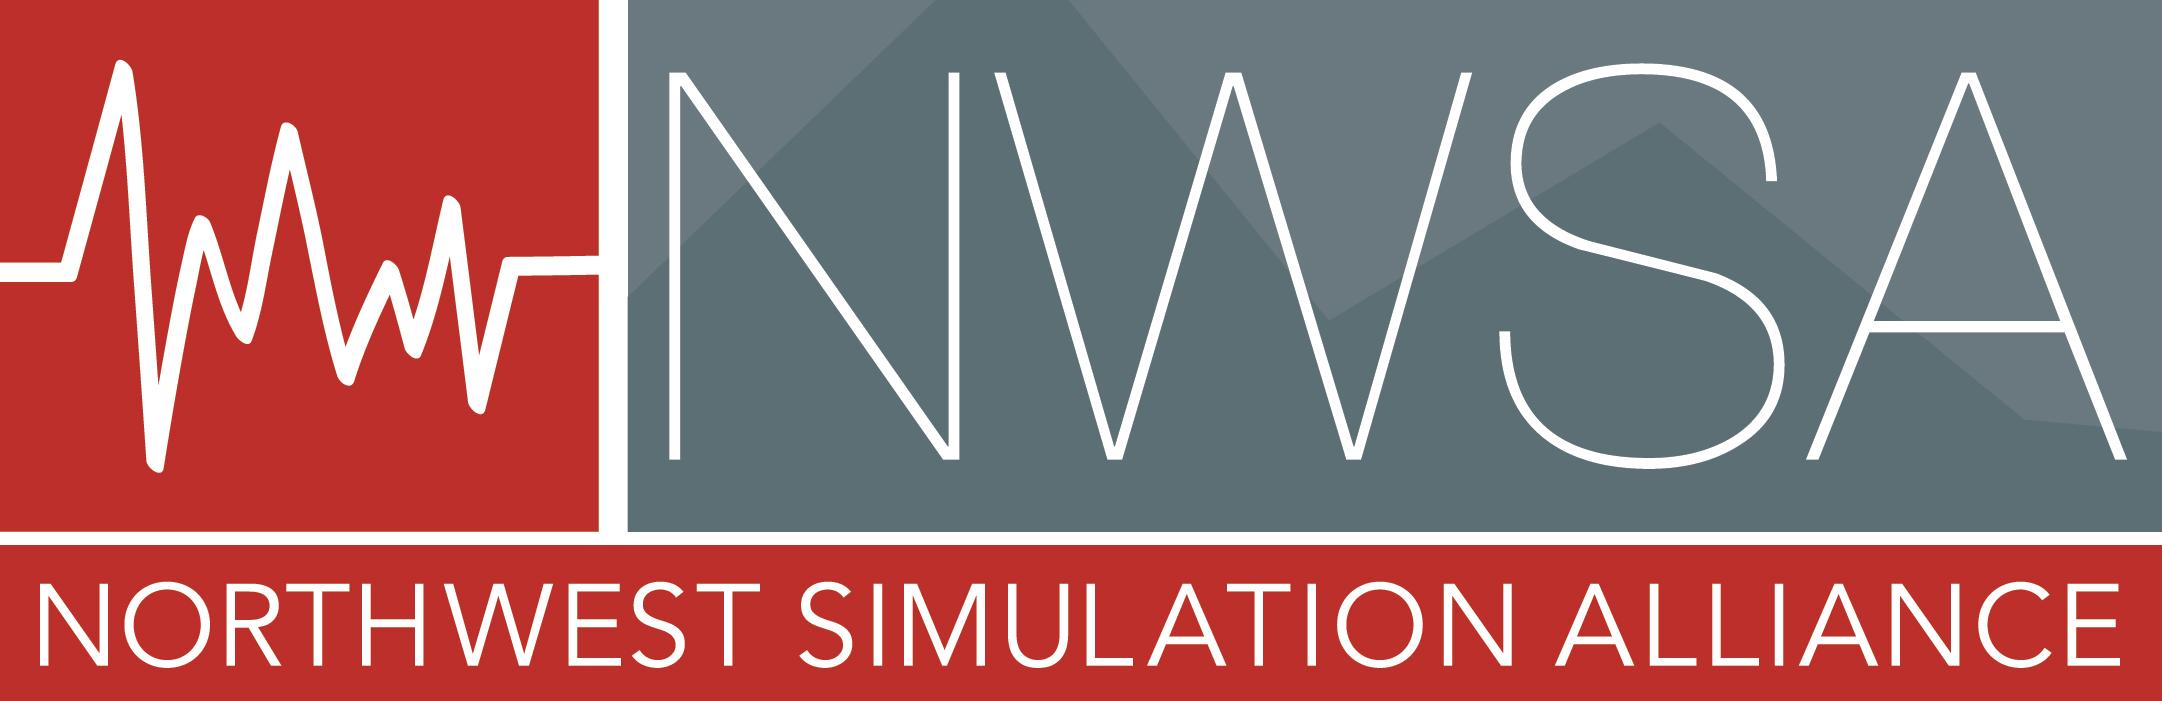 nwsa_new_logo_web.jpg